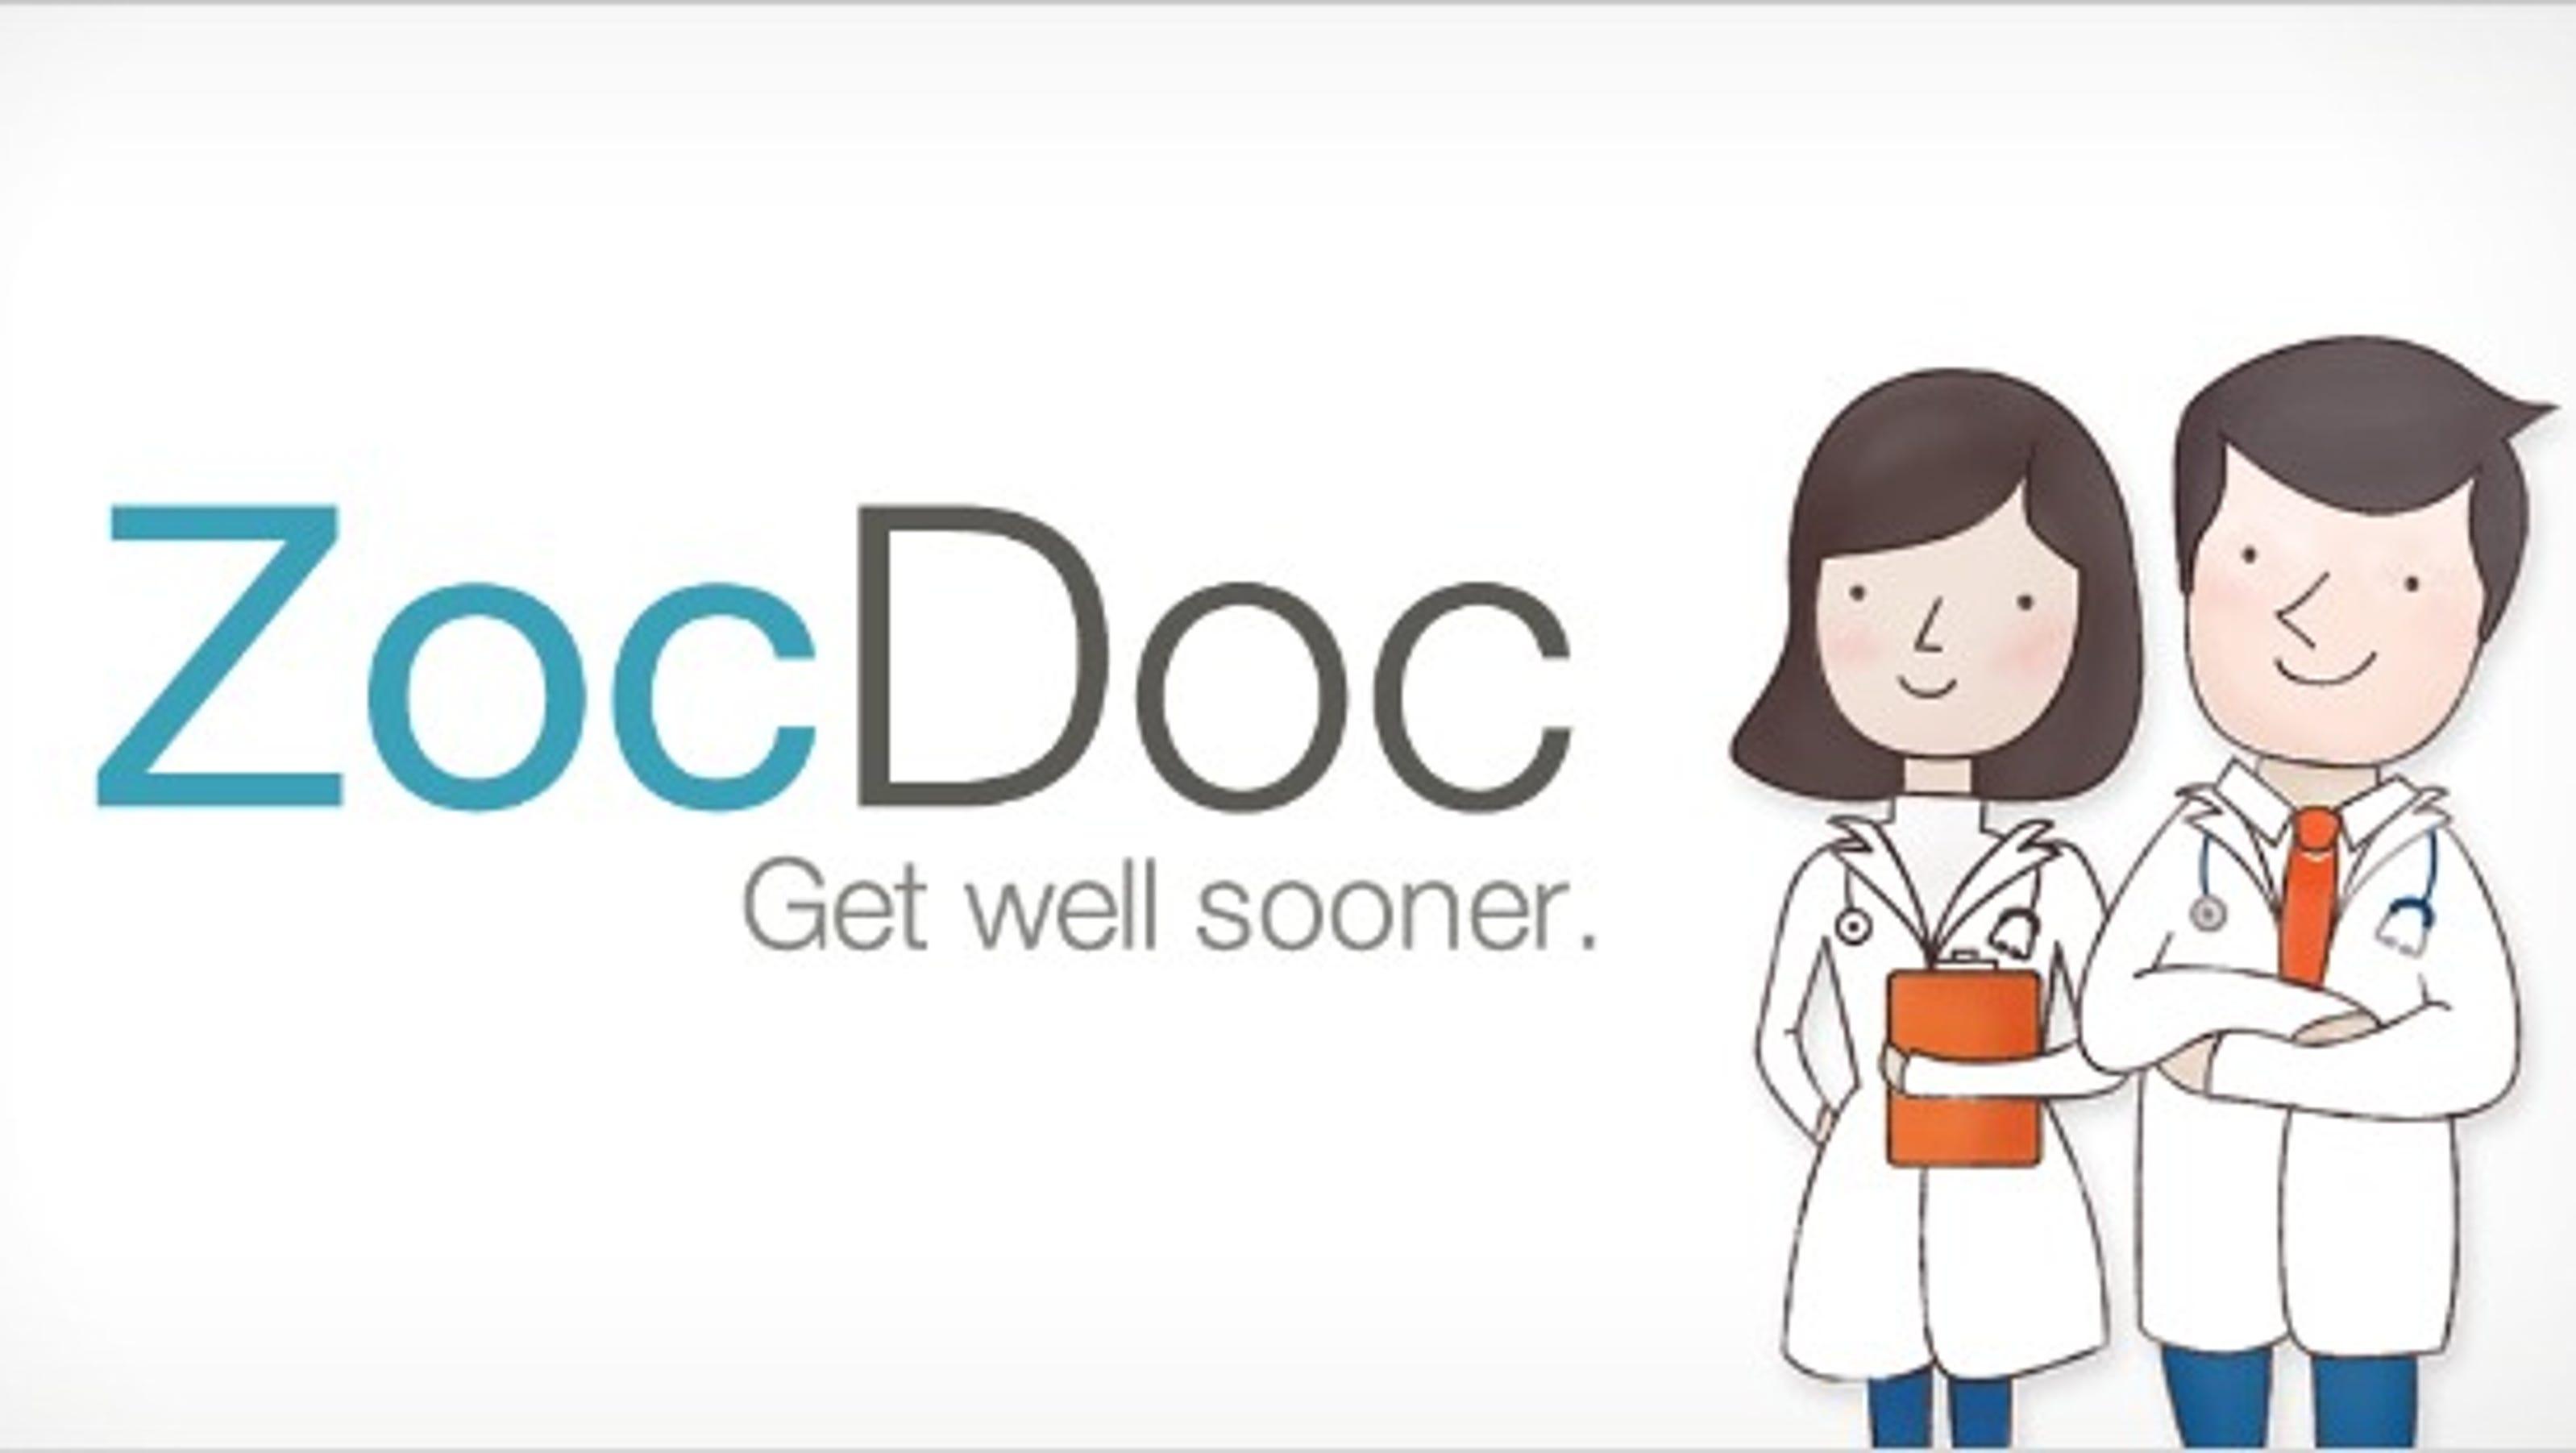 ZocDoc app helps patie...W Zocdoc Connect